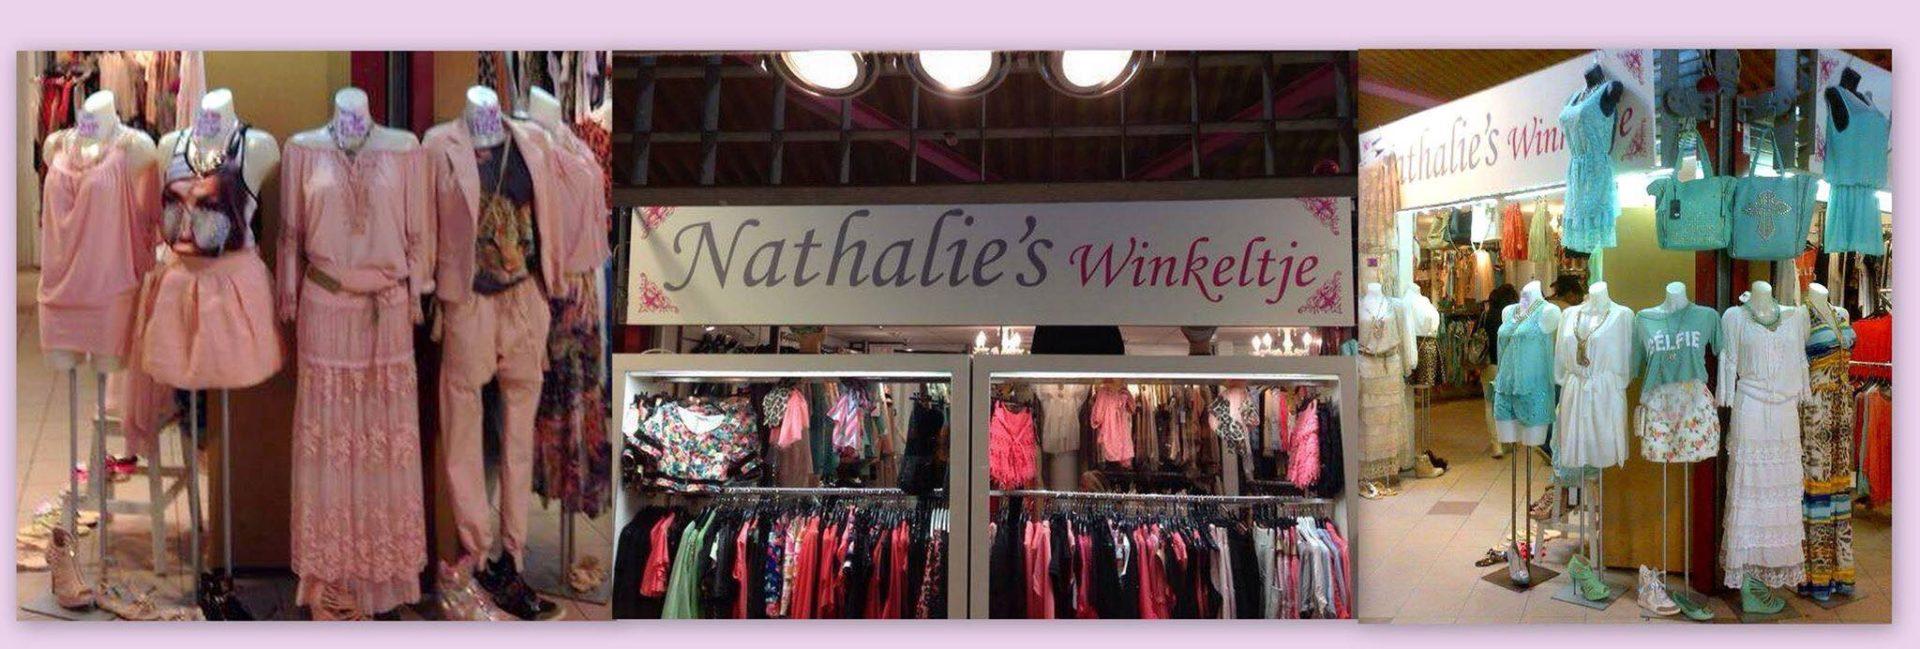 Nathalies winkeltje